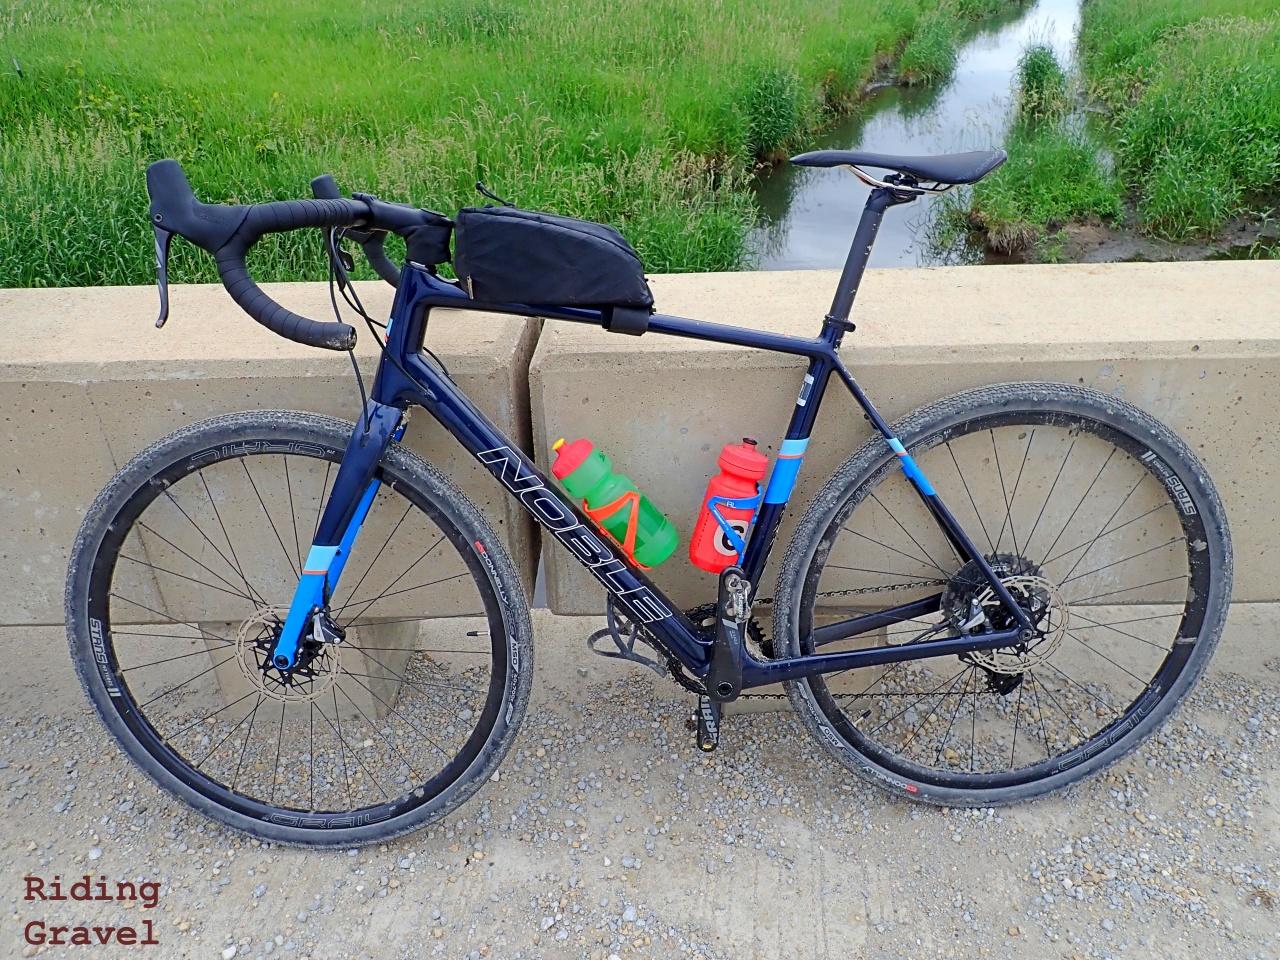 Noble Bikes GX5 Gravel Bike: At The Finish